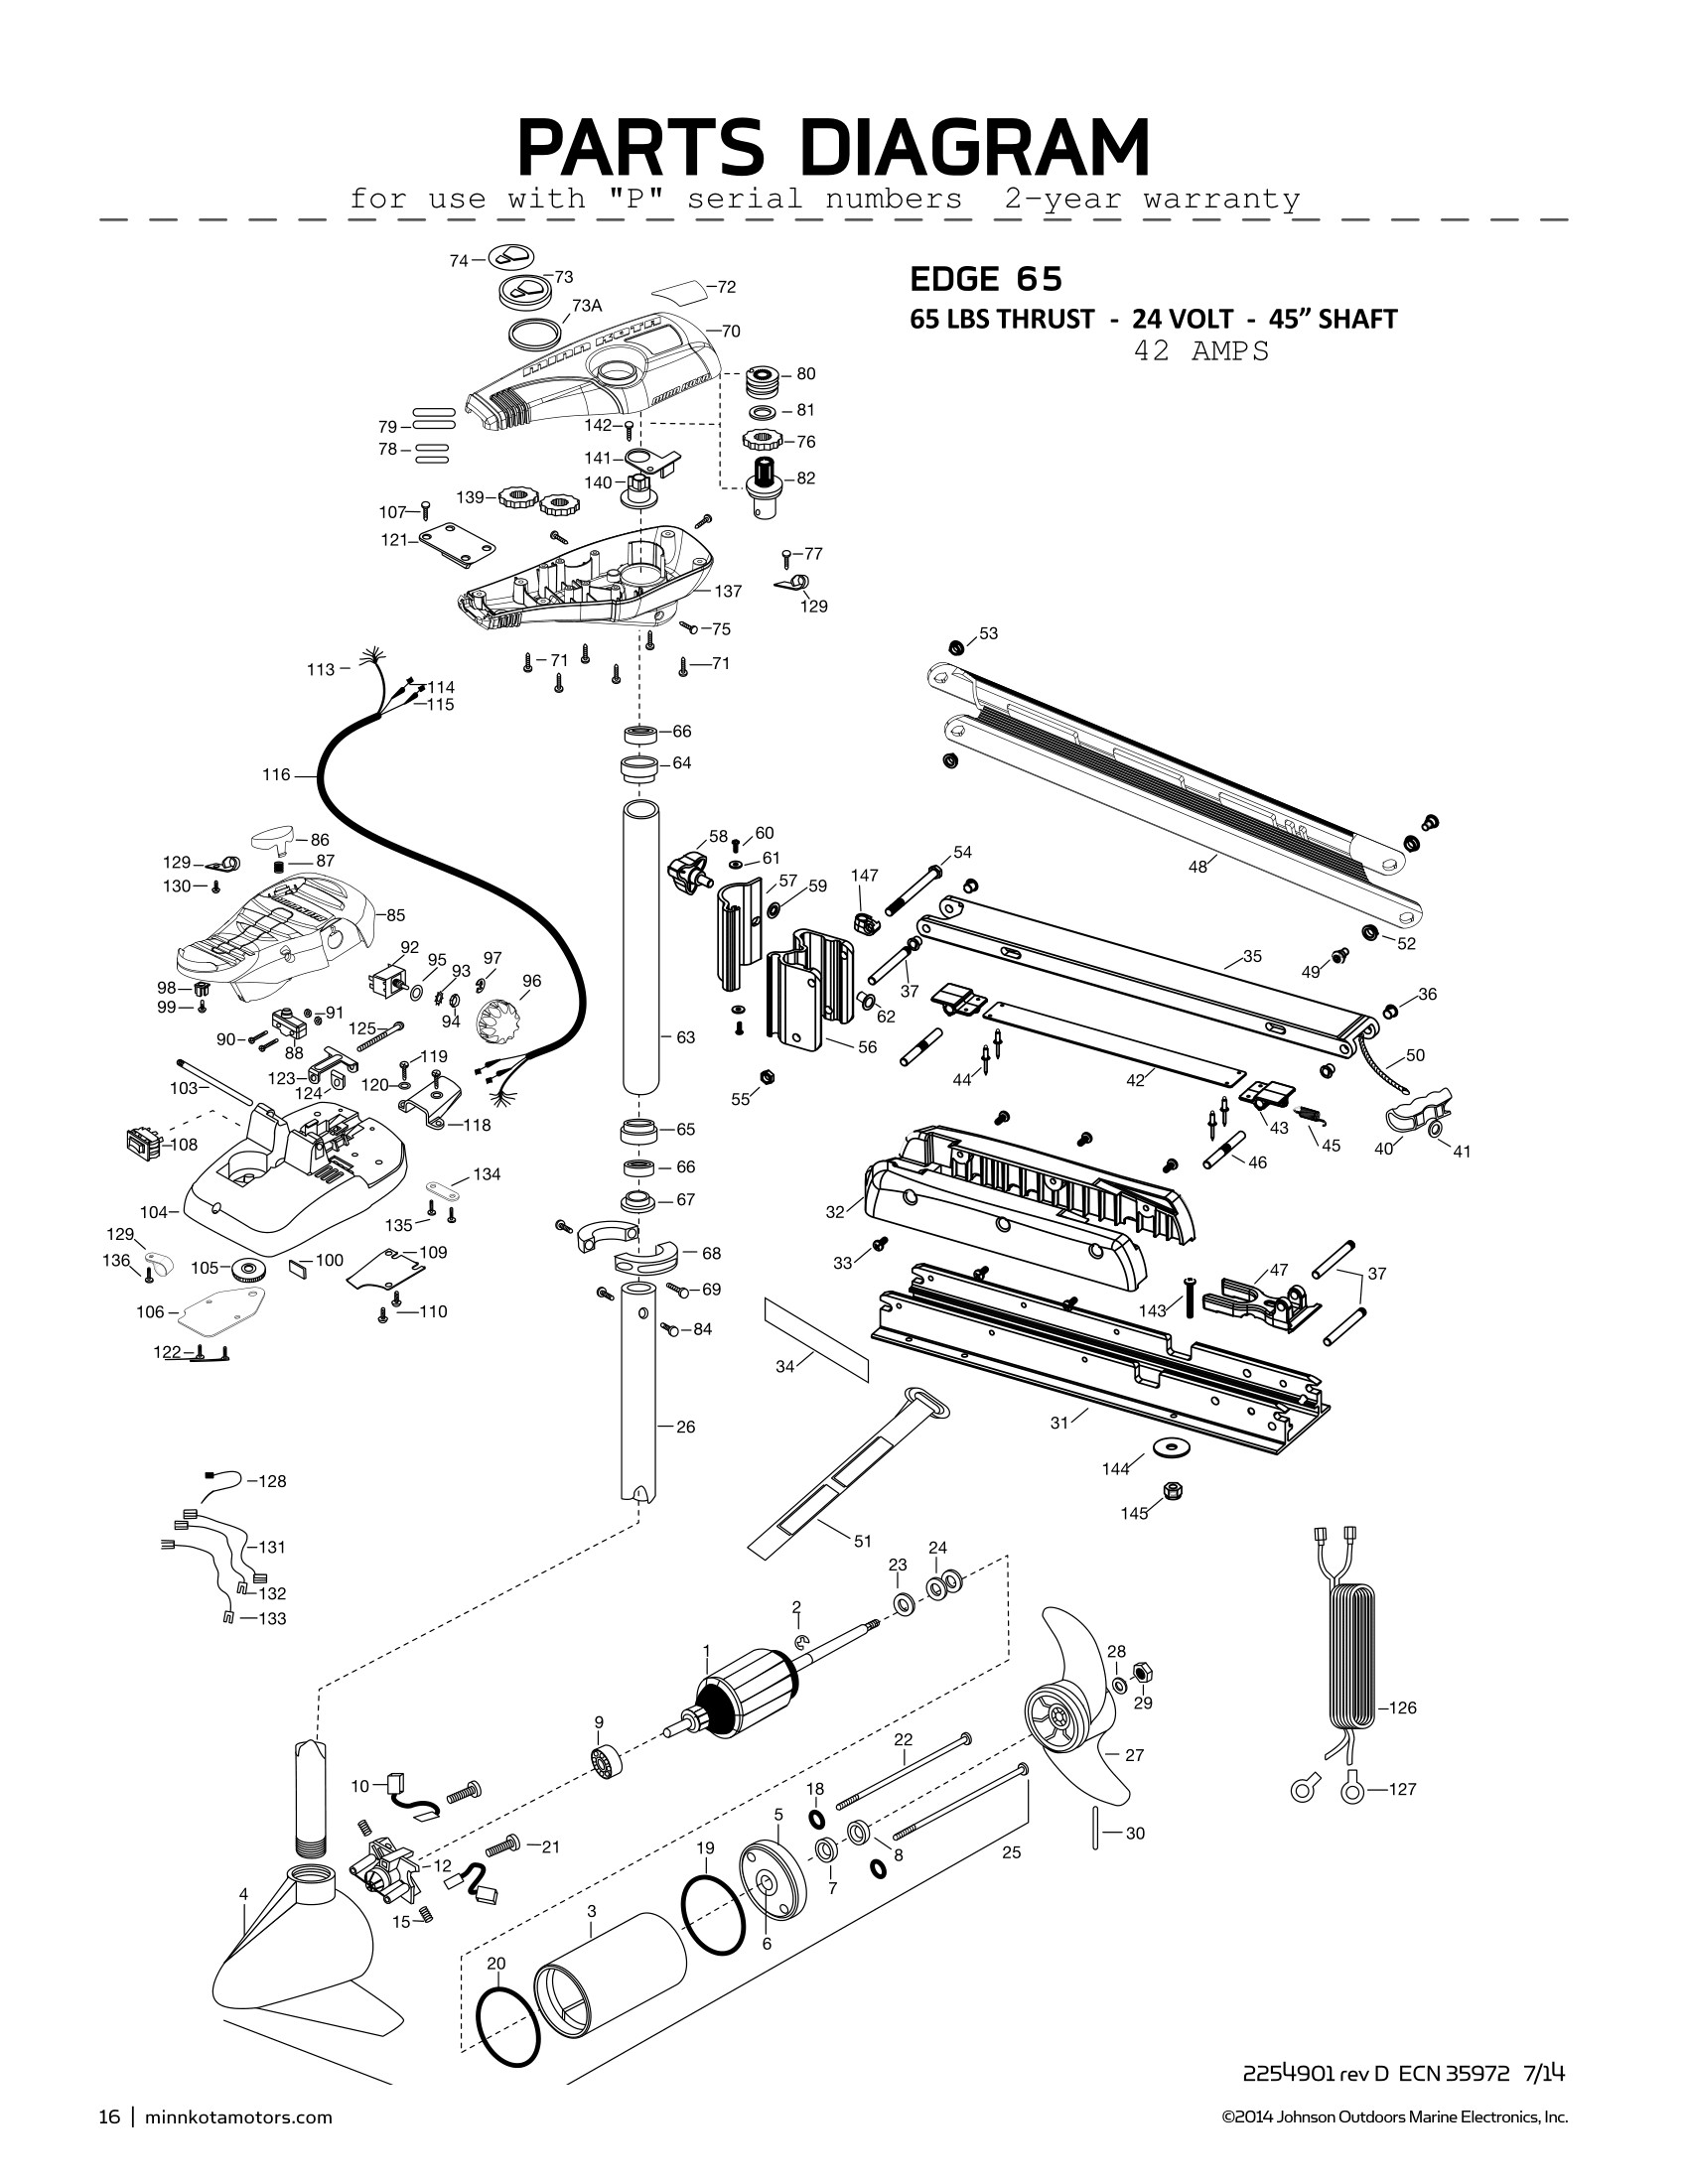 Blue Wire On Garmin Striker 4 Minn Kota Edge 65 Parts 2015 From Fish307 Of Blue Wire On Garmin Striker 4